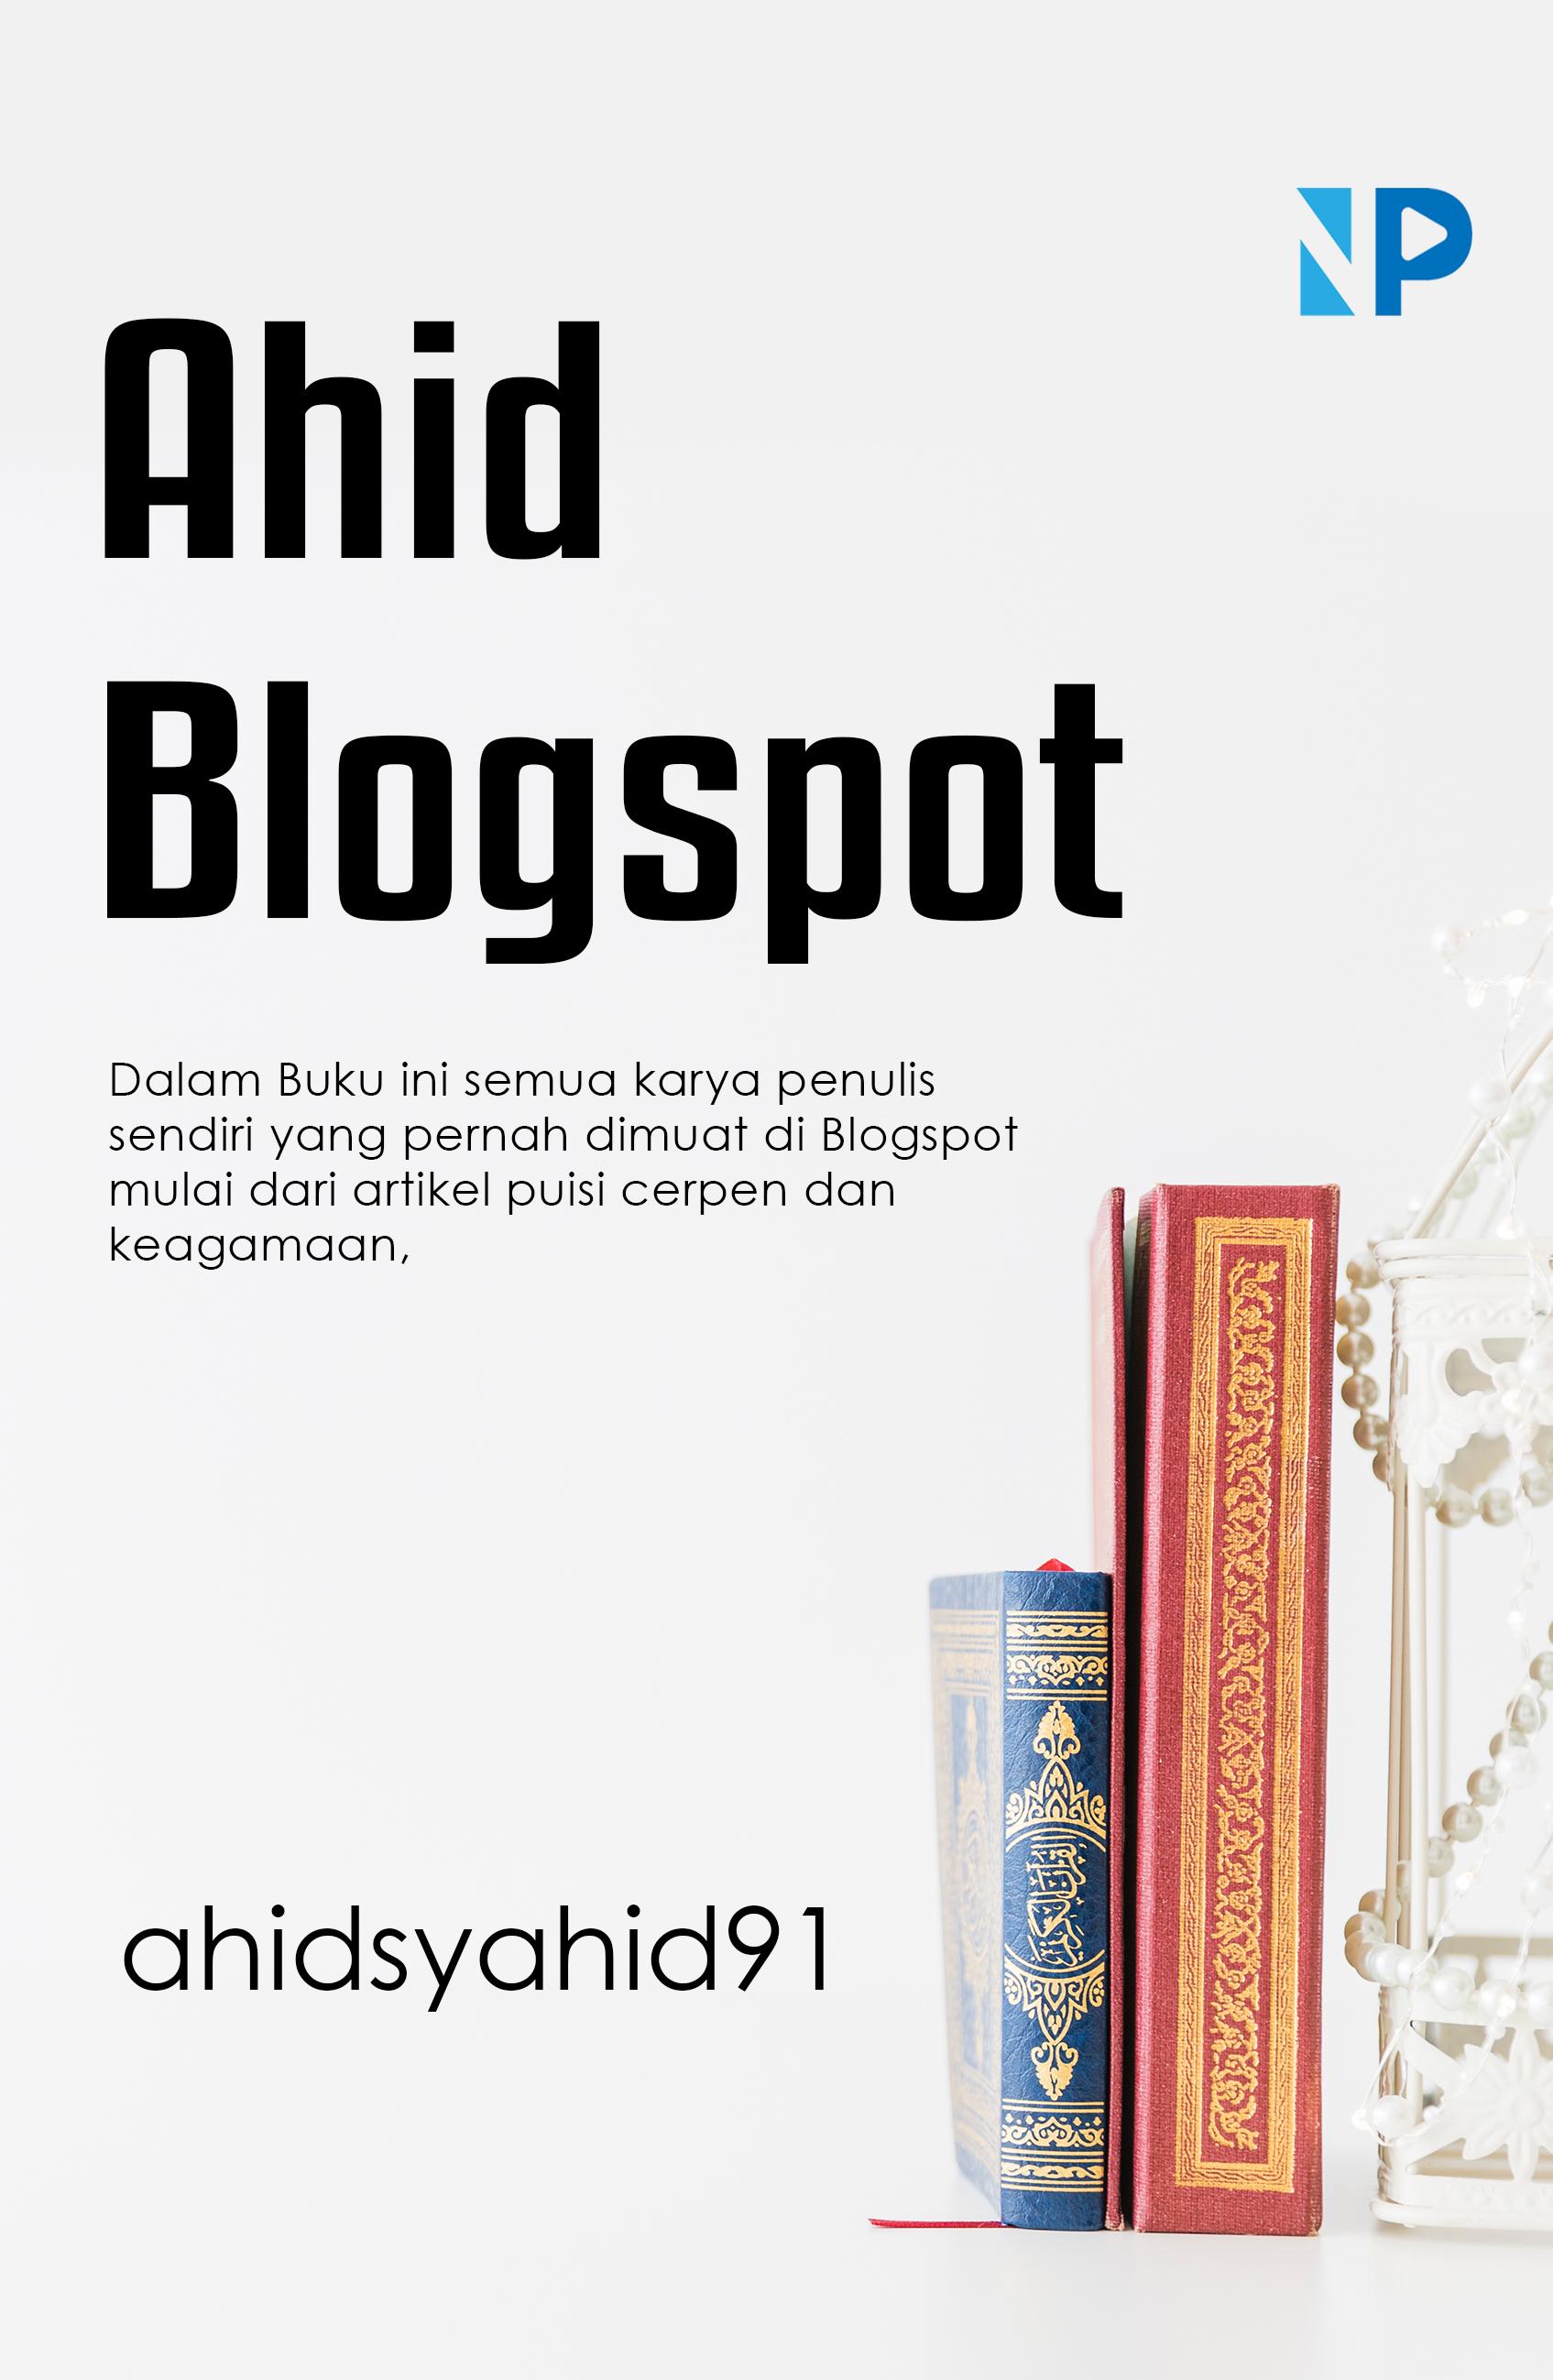 Ahid blogspot [sumber elektronis]